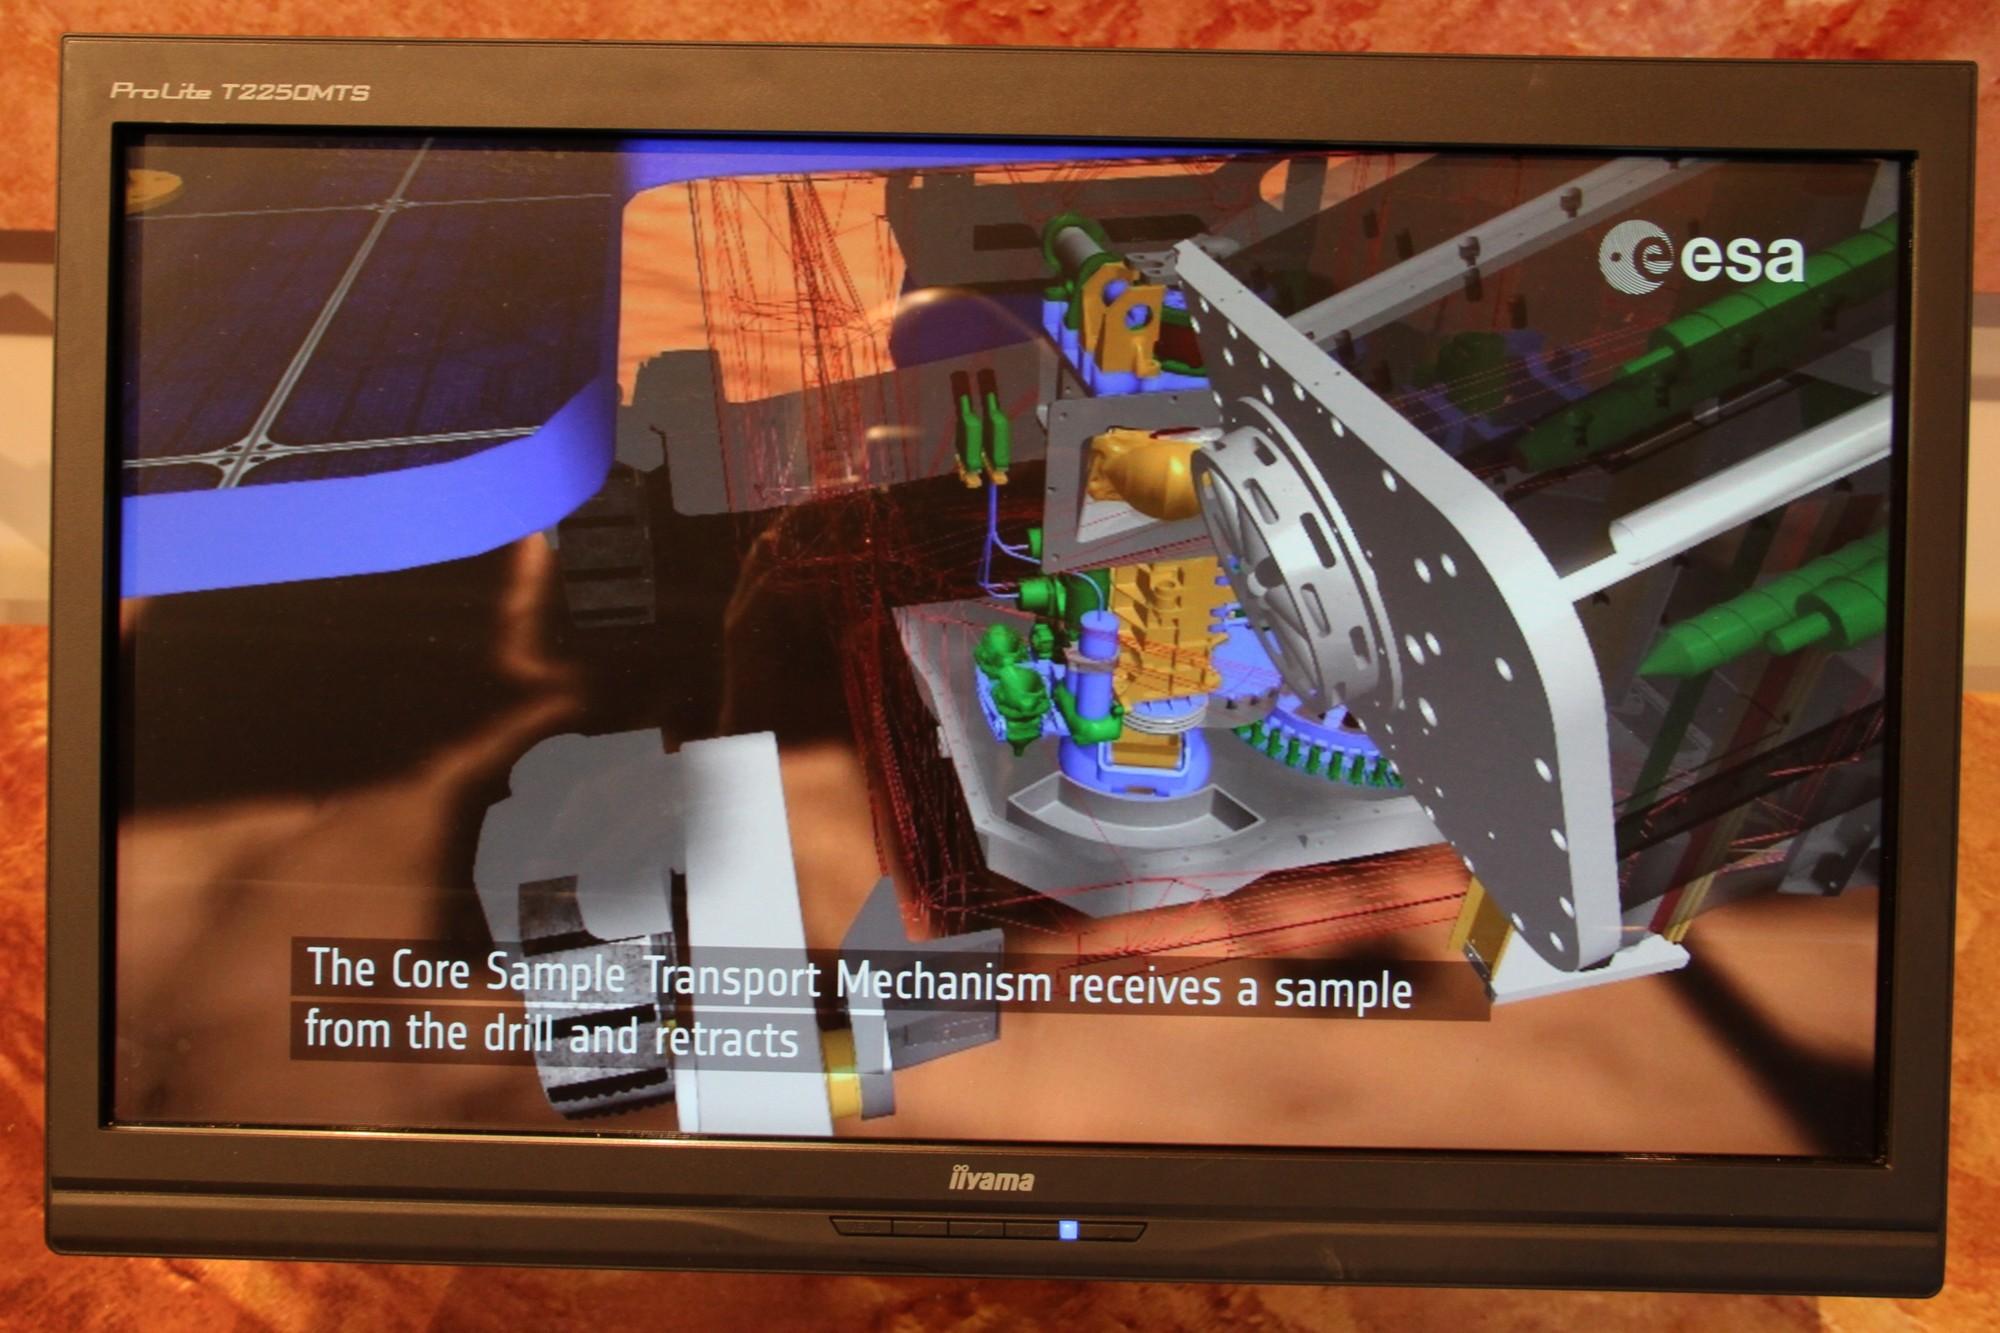 15 06 16 - 13h 43m 55s - Bourget ESA Mars r